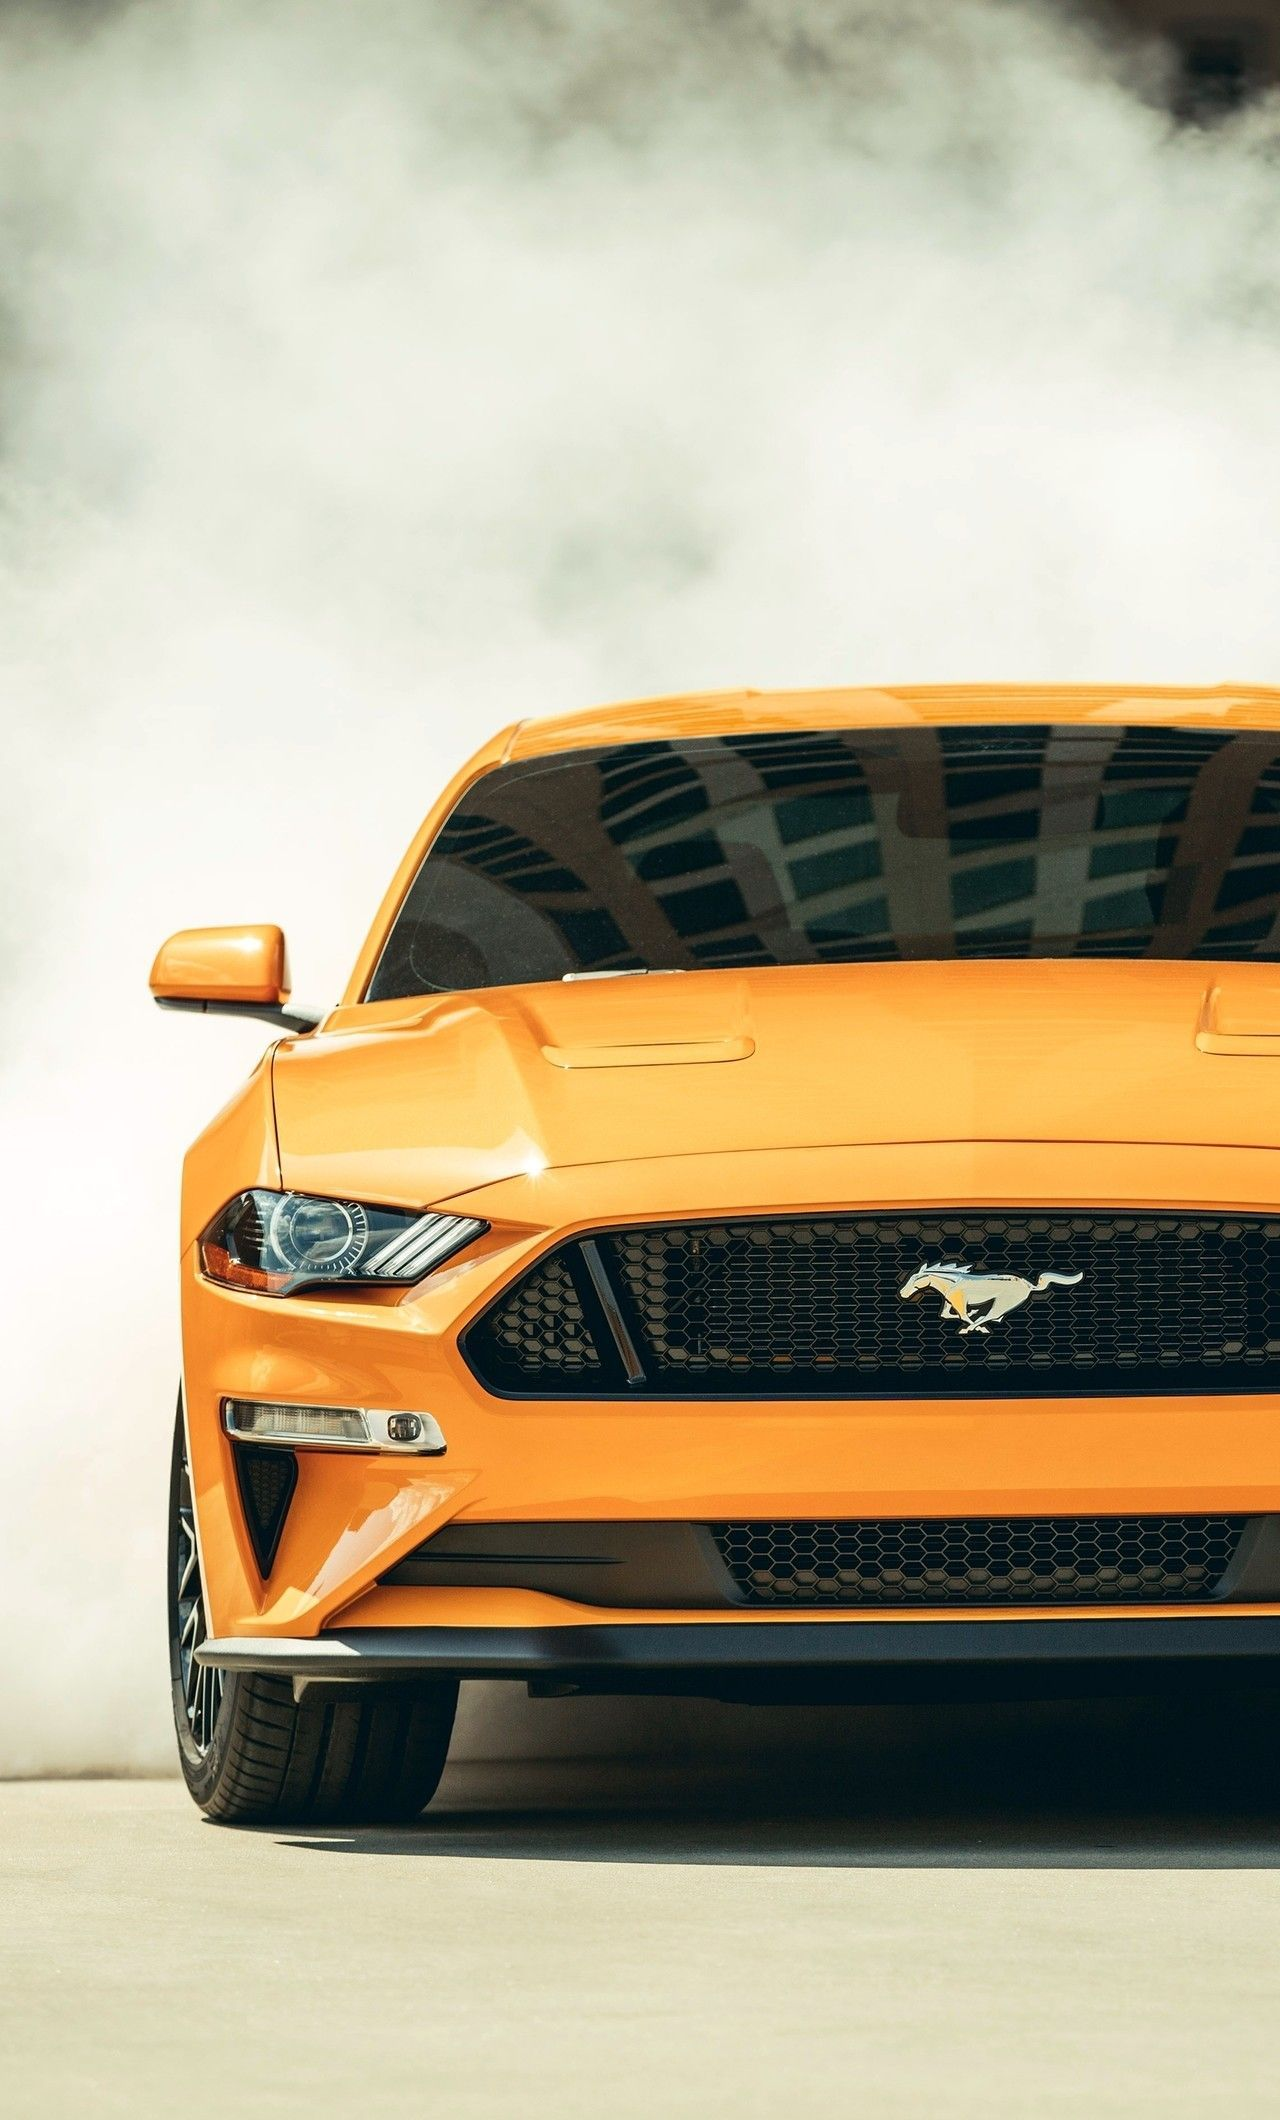 Full Hd Mustang Iphone Wallpaper in 2020 Mustang iphone